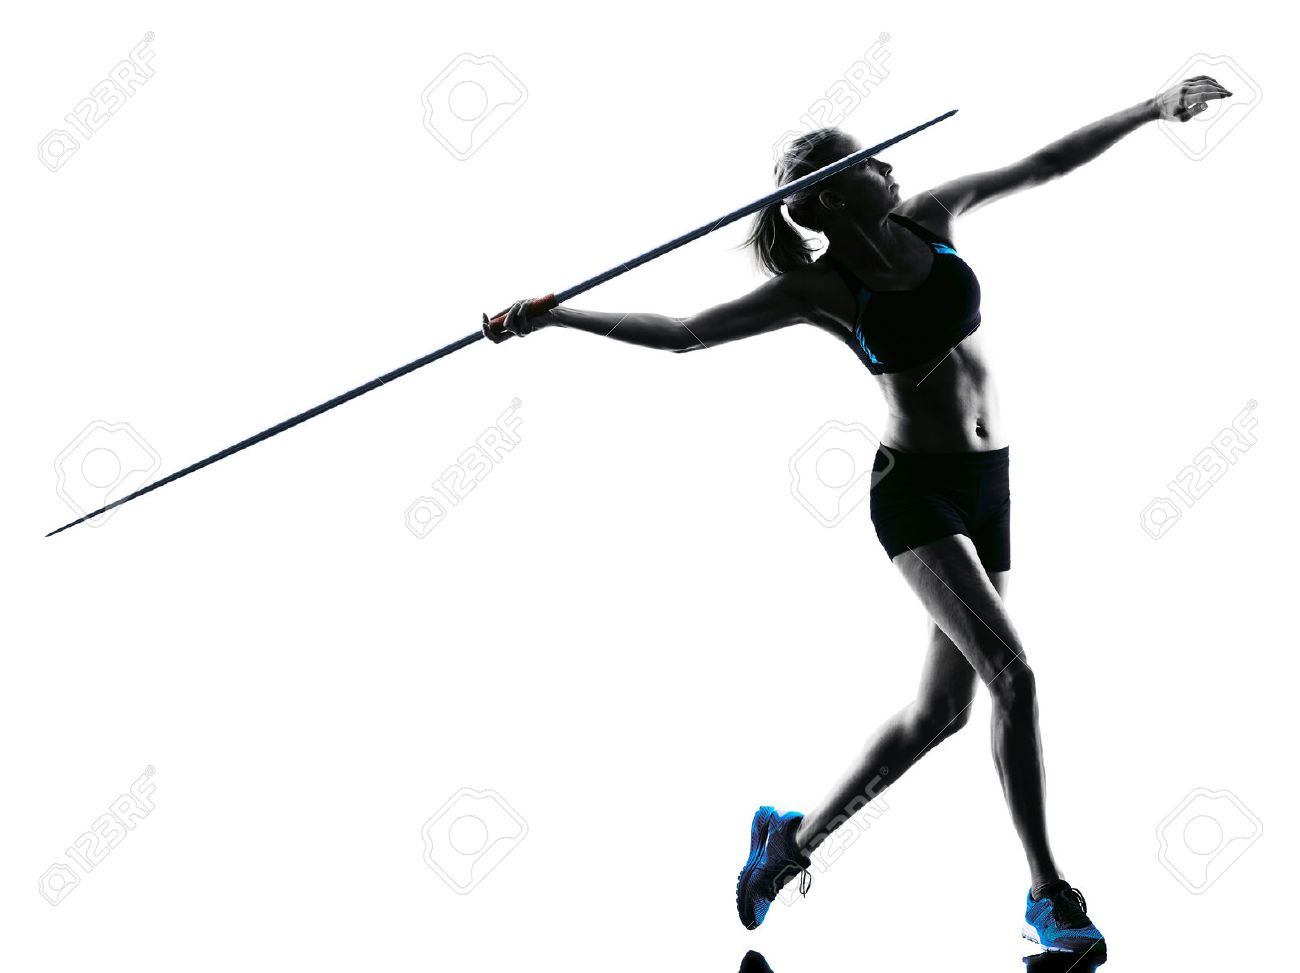 Javelin thrower - Google Search